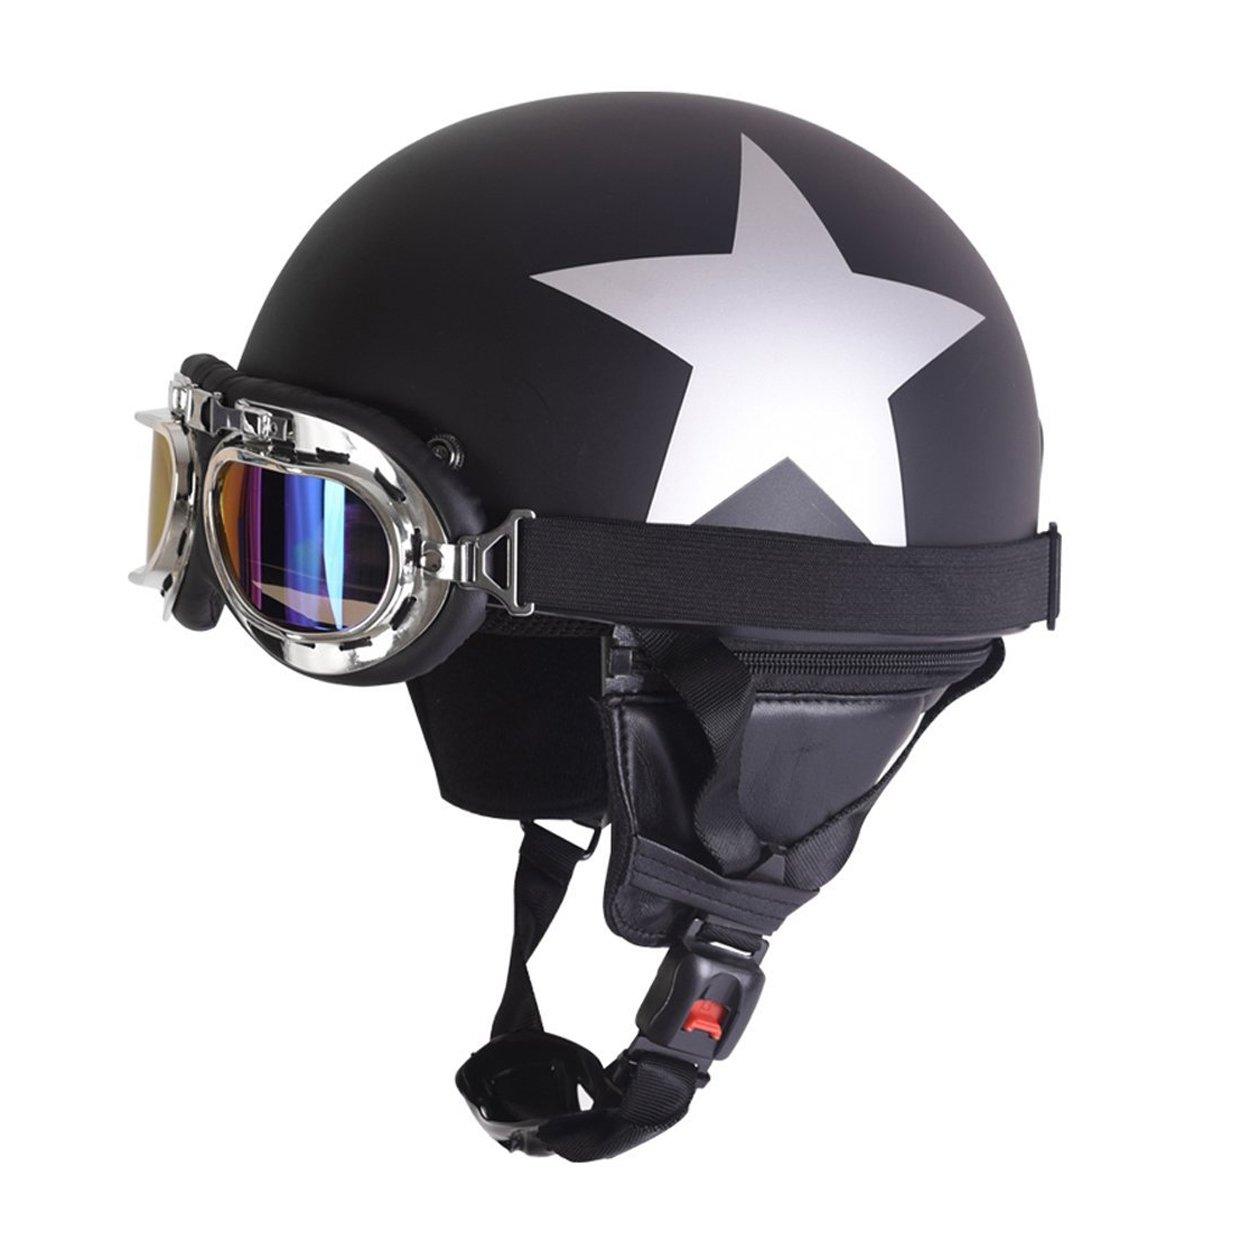 Amazon.es: FuriAuto casco con gafas de motorista motocicleta crucero de casco de moto viseras proteccion UV